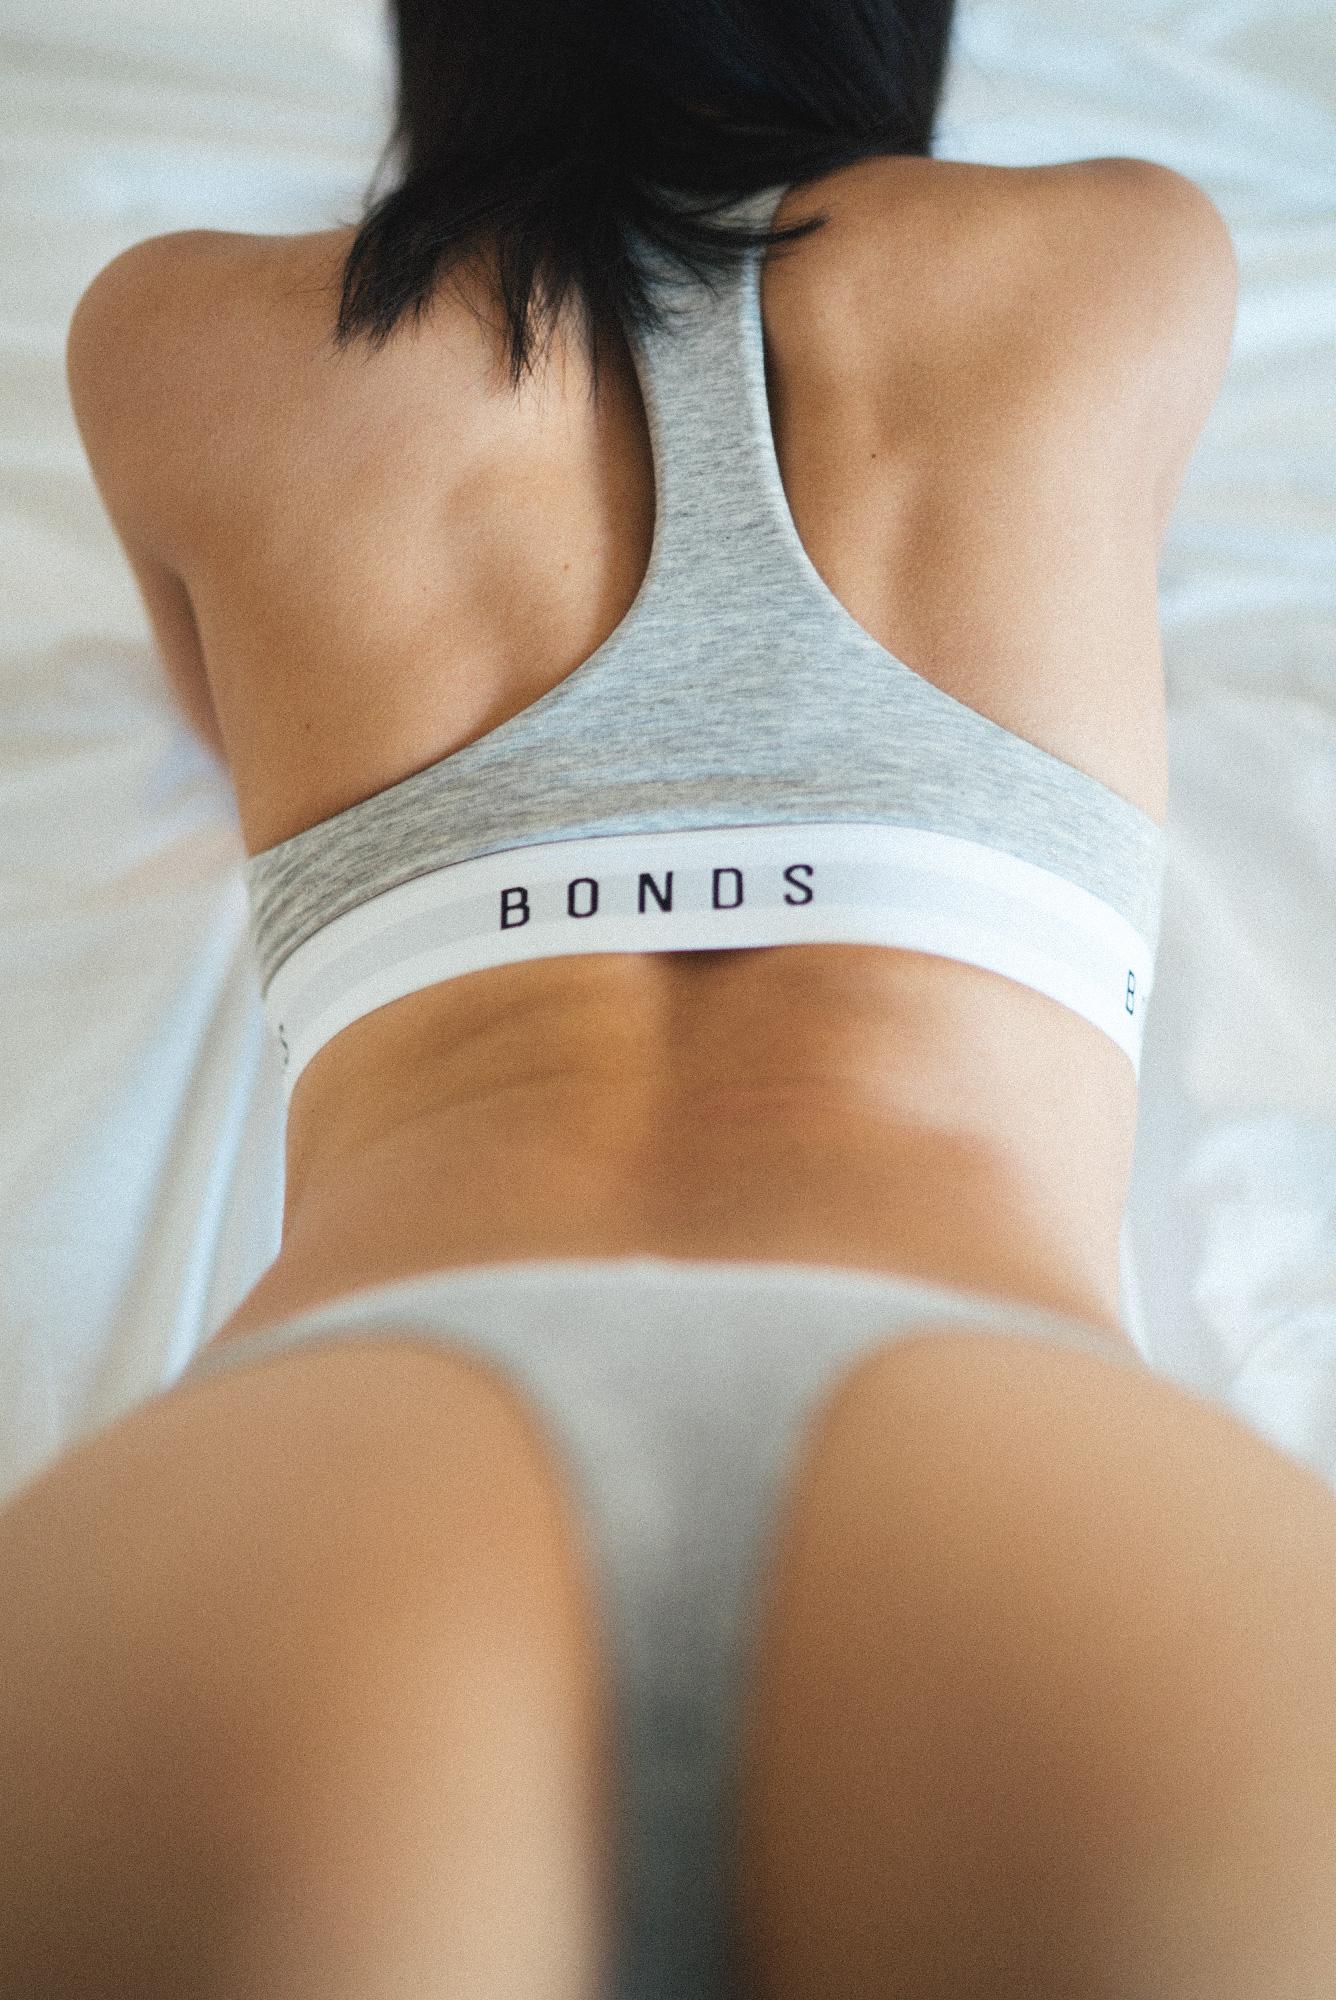 deadlyenvy_bonds_13